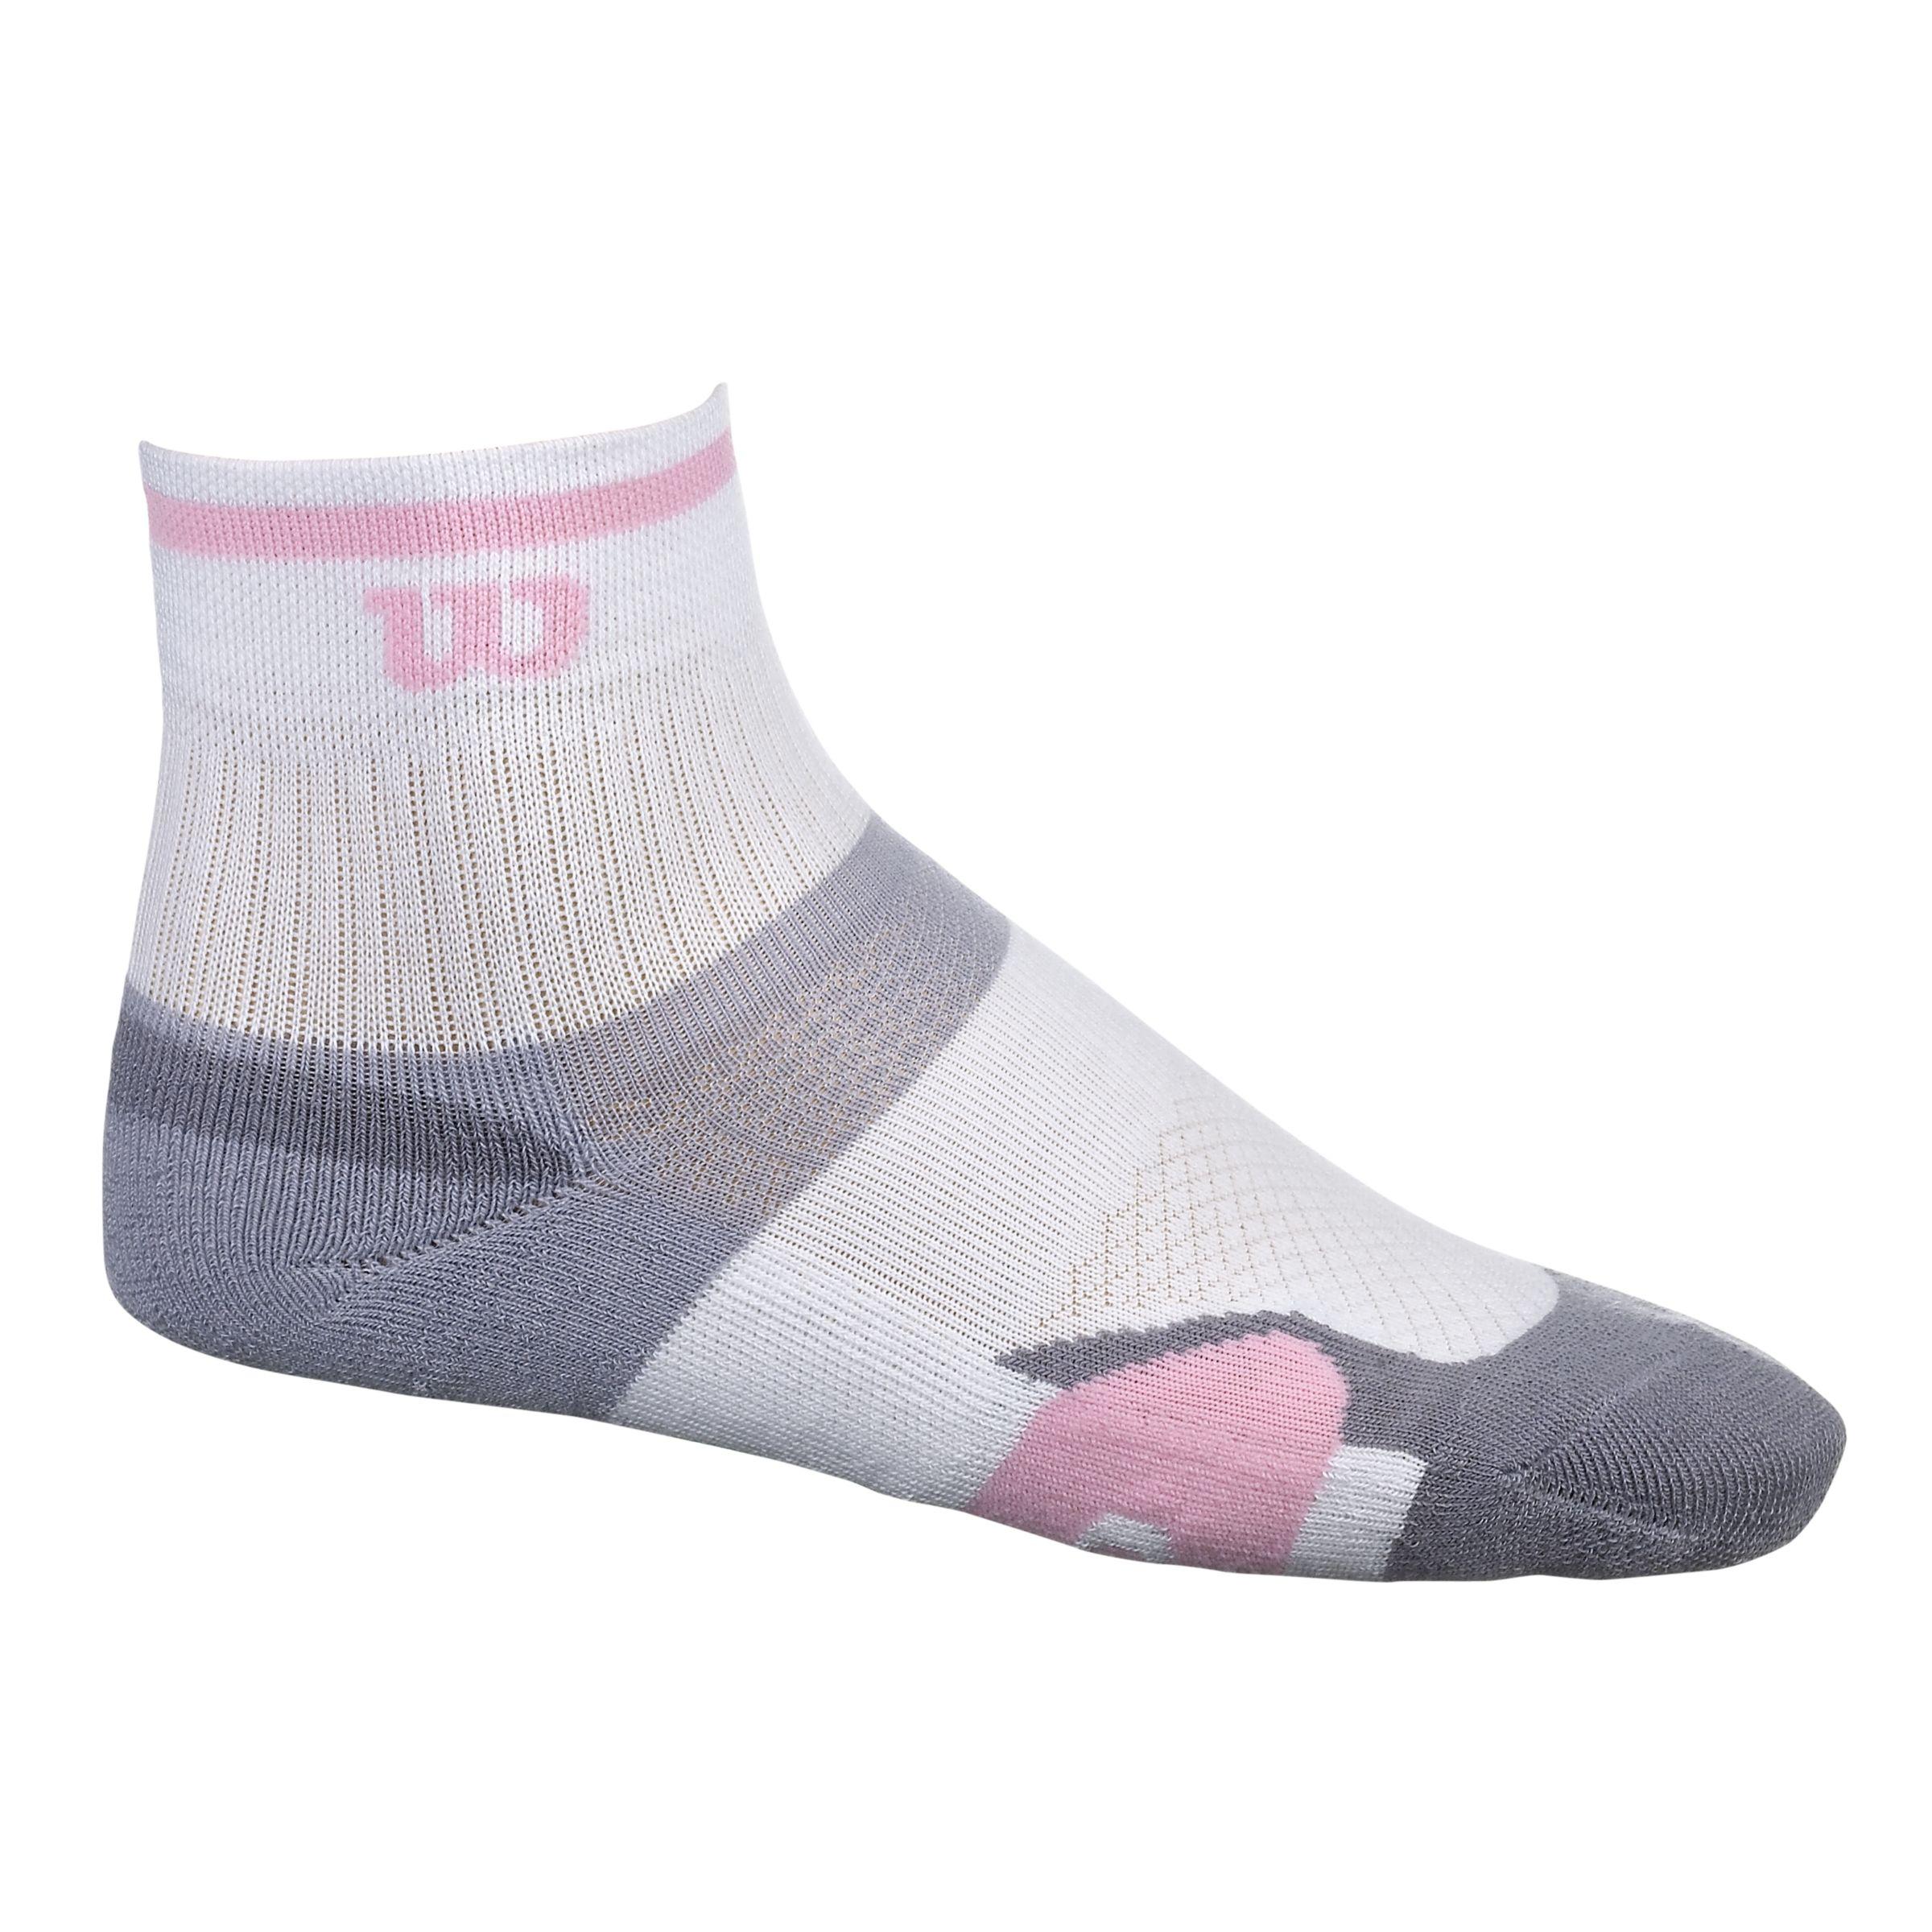 Wilson Wilson ErgoStep Women's Tennis Socks, White/Grey/Pink, 4-8